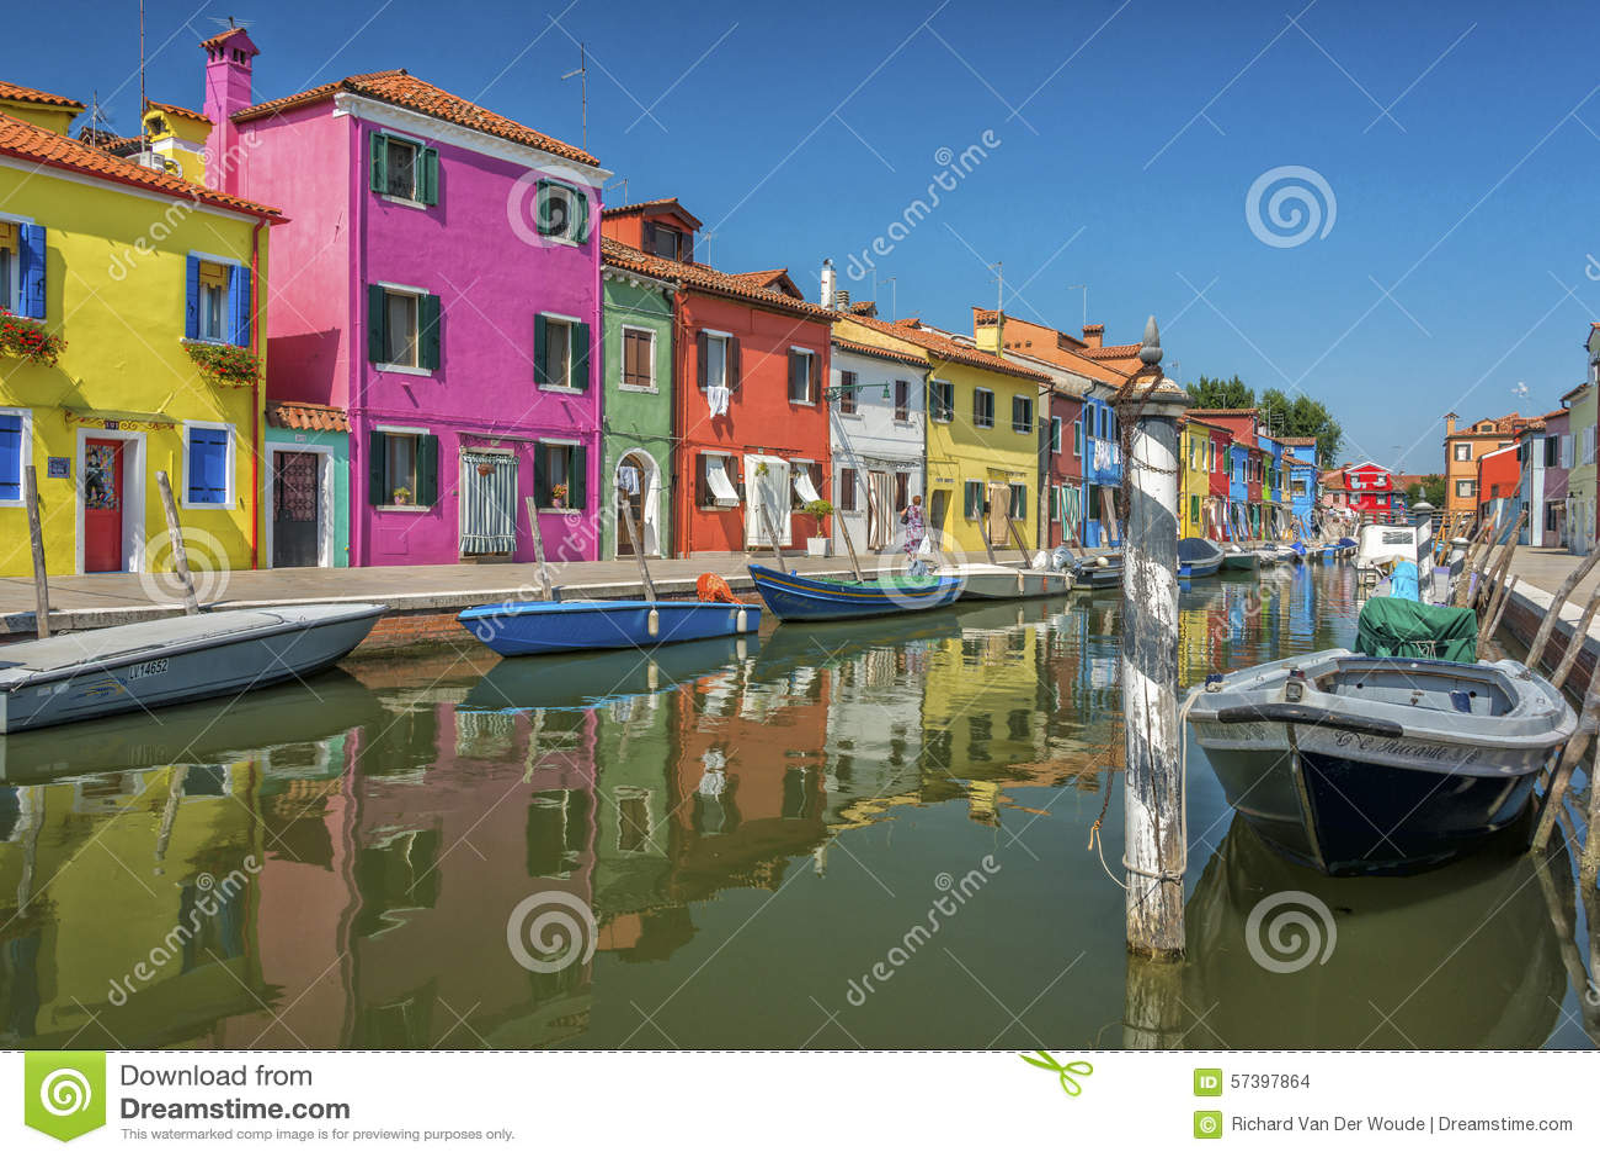 Een kanaal in Burano, Italië